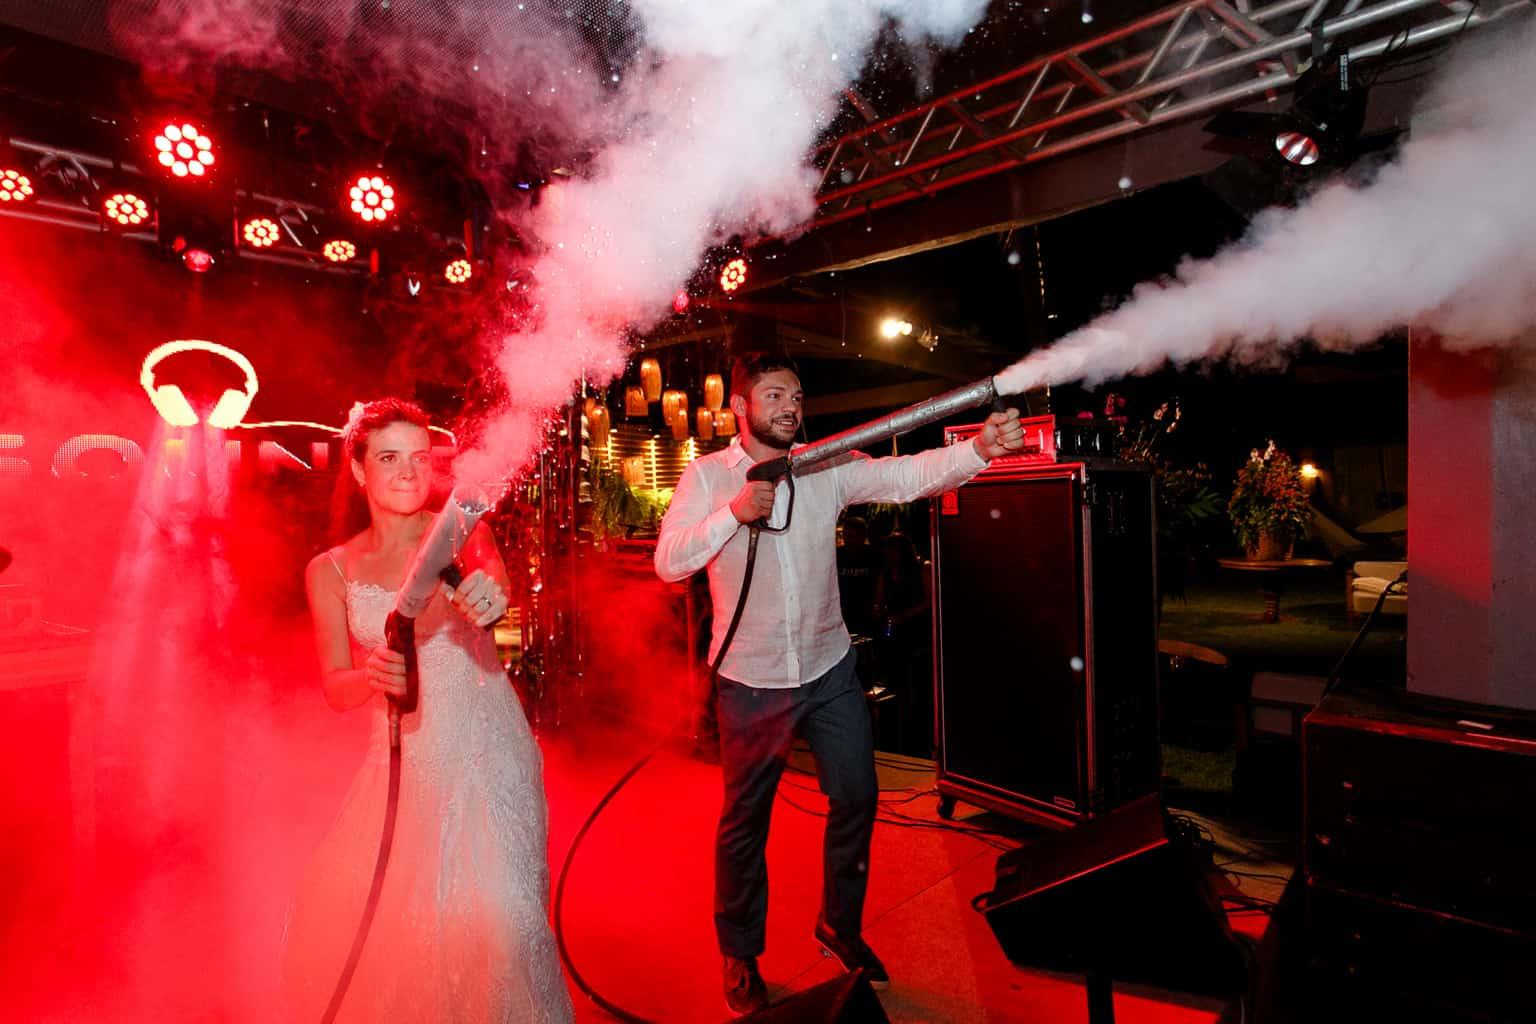 Casamento-Emanuelle-e-Alysson-Fotografia-Tadeu-Nanó-e-Luca-Antunes207